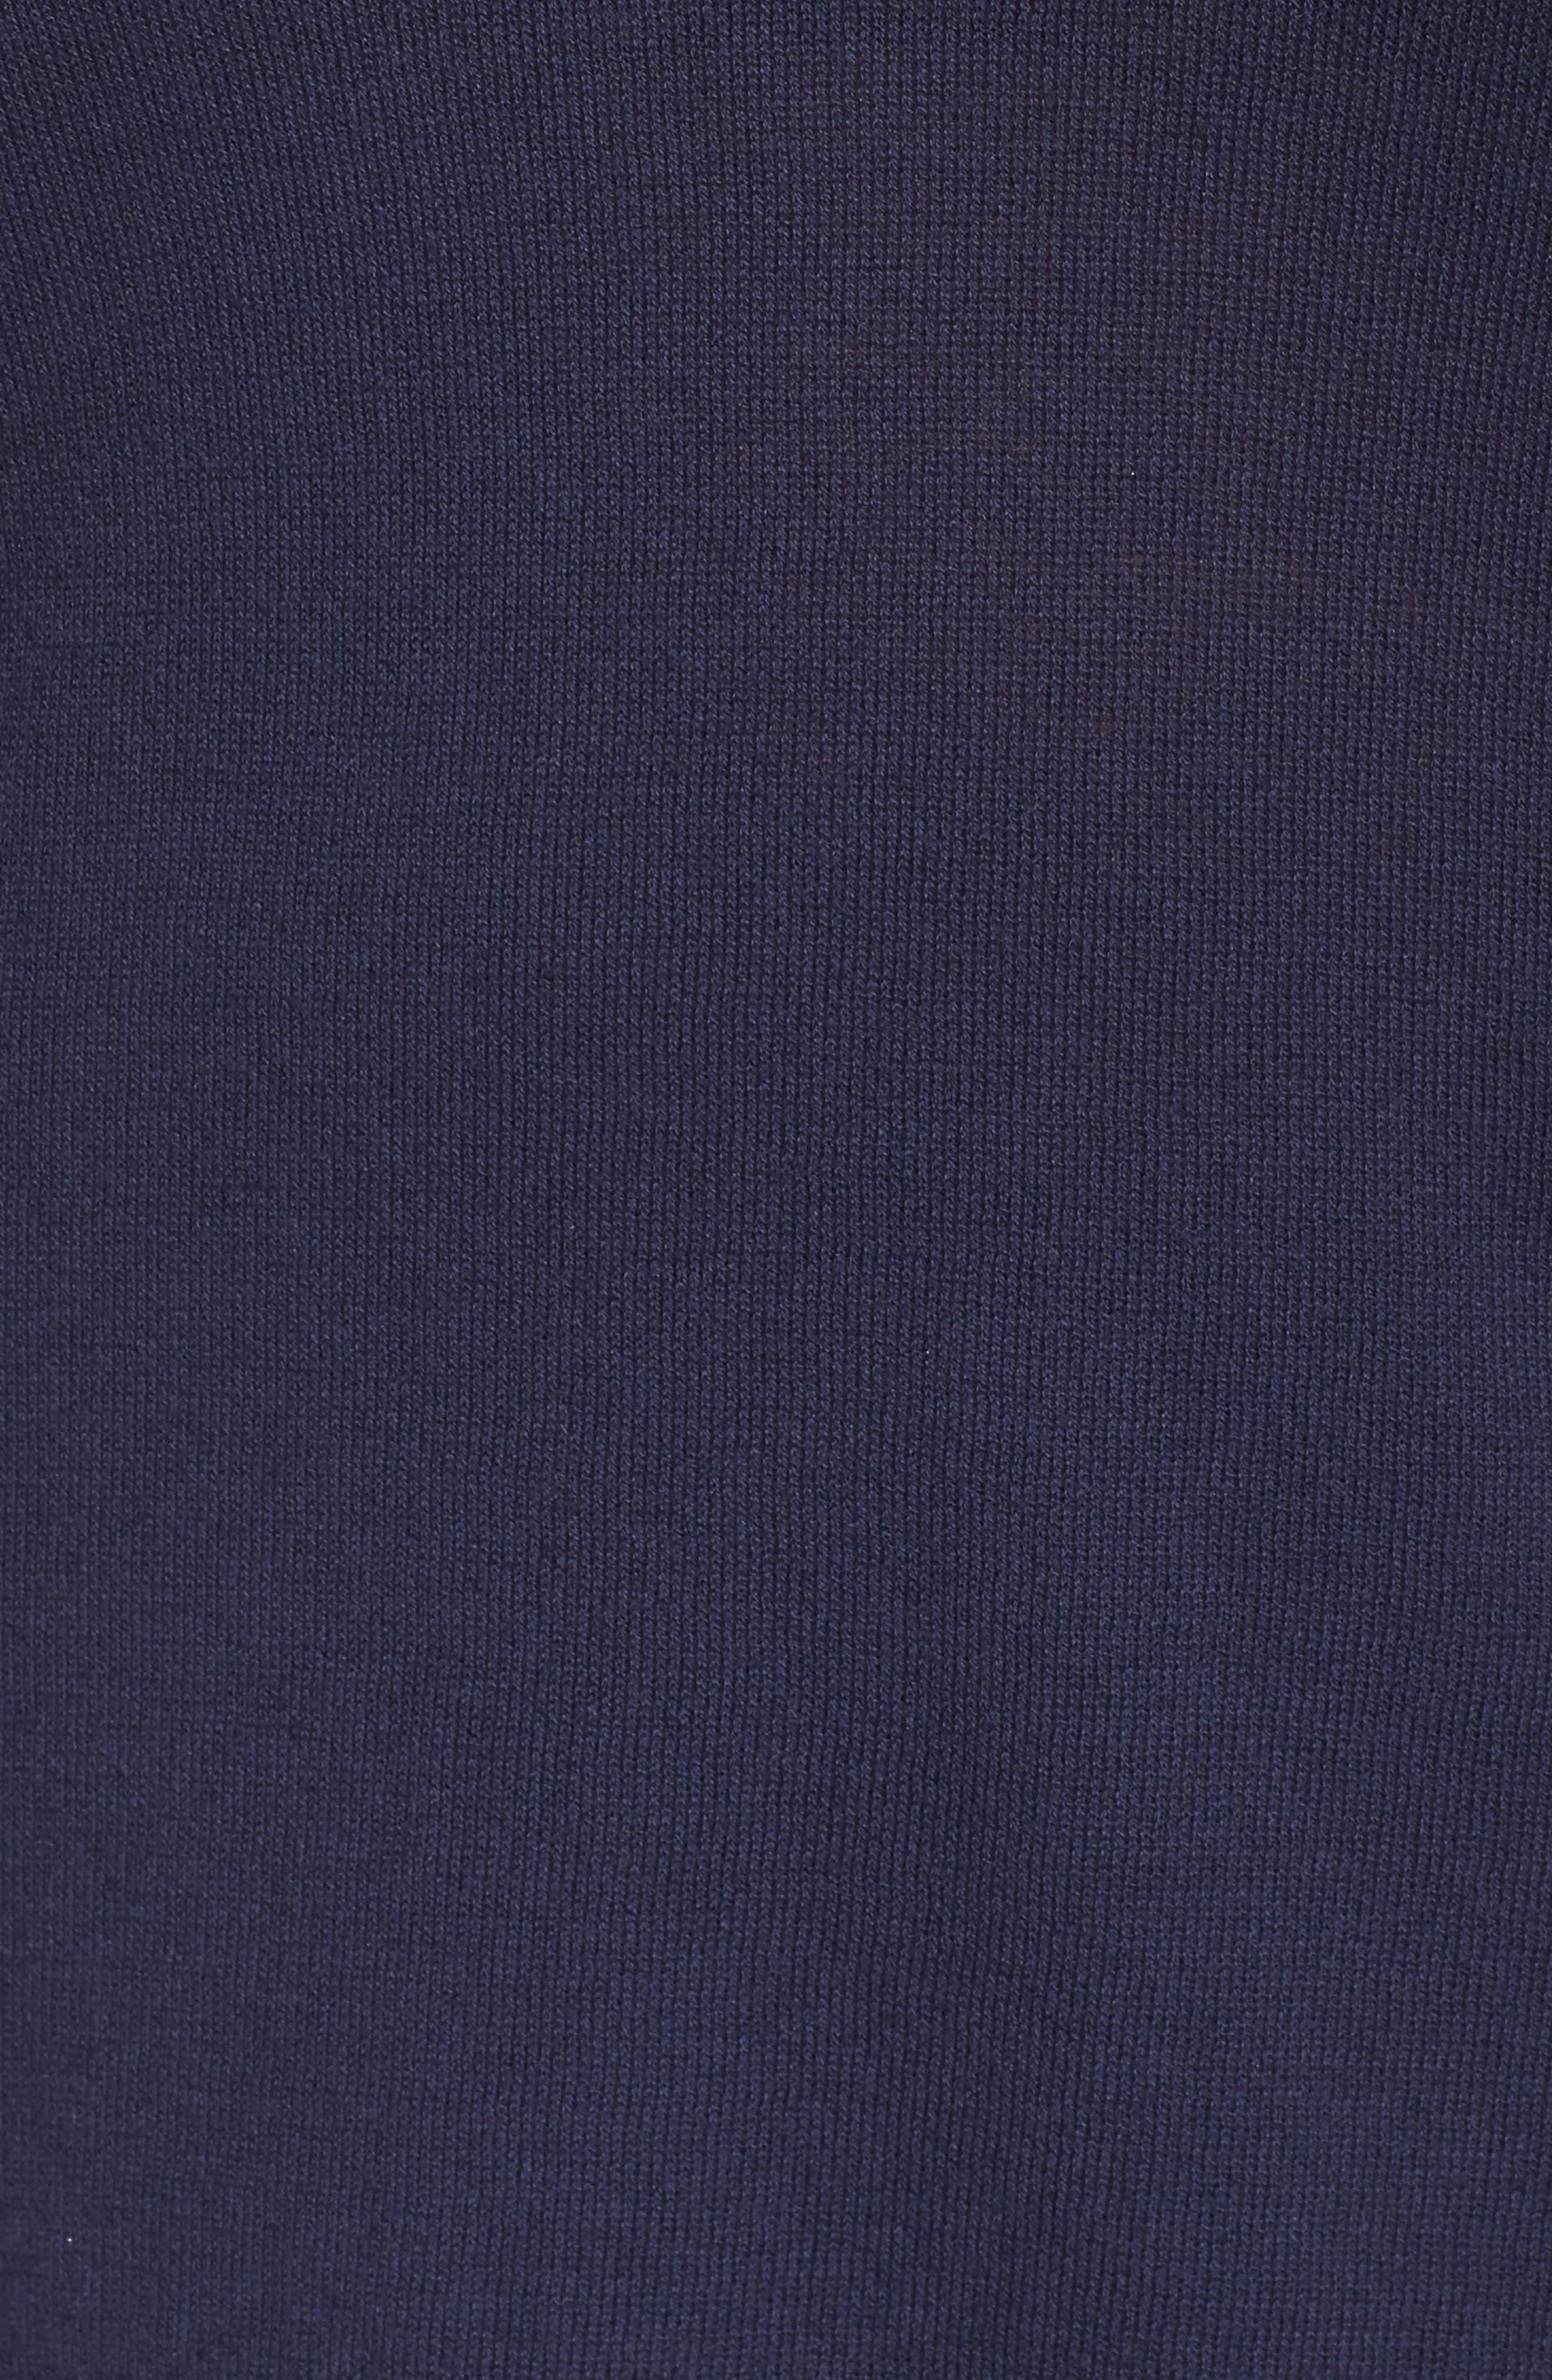 Mix Media Sweater,                             Alternate thumbnail 5, color,                             410